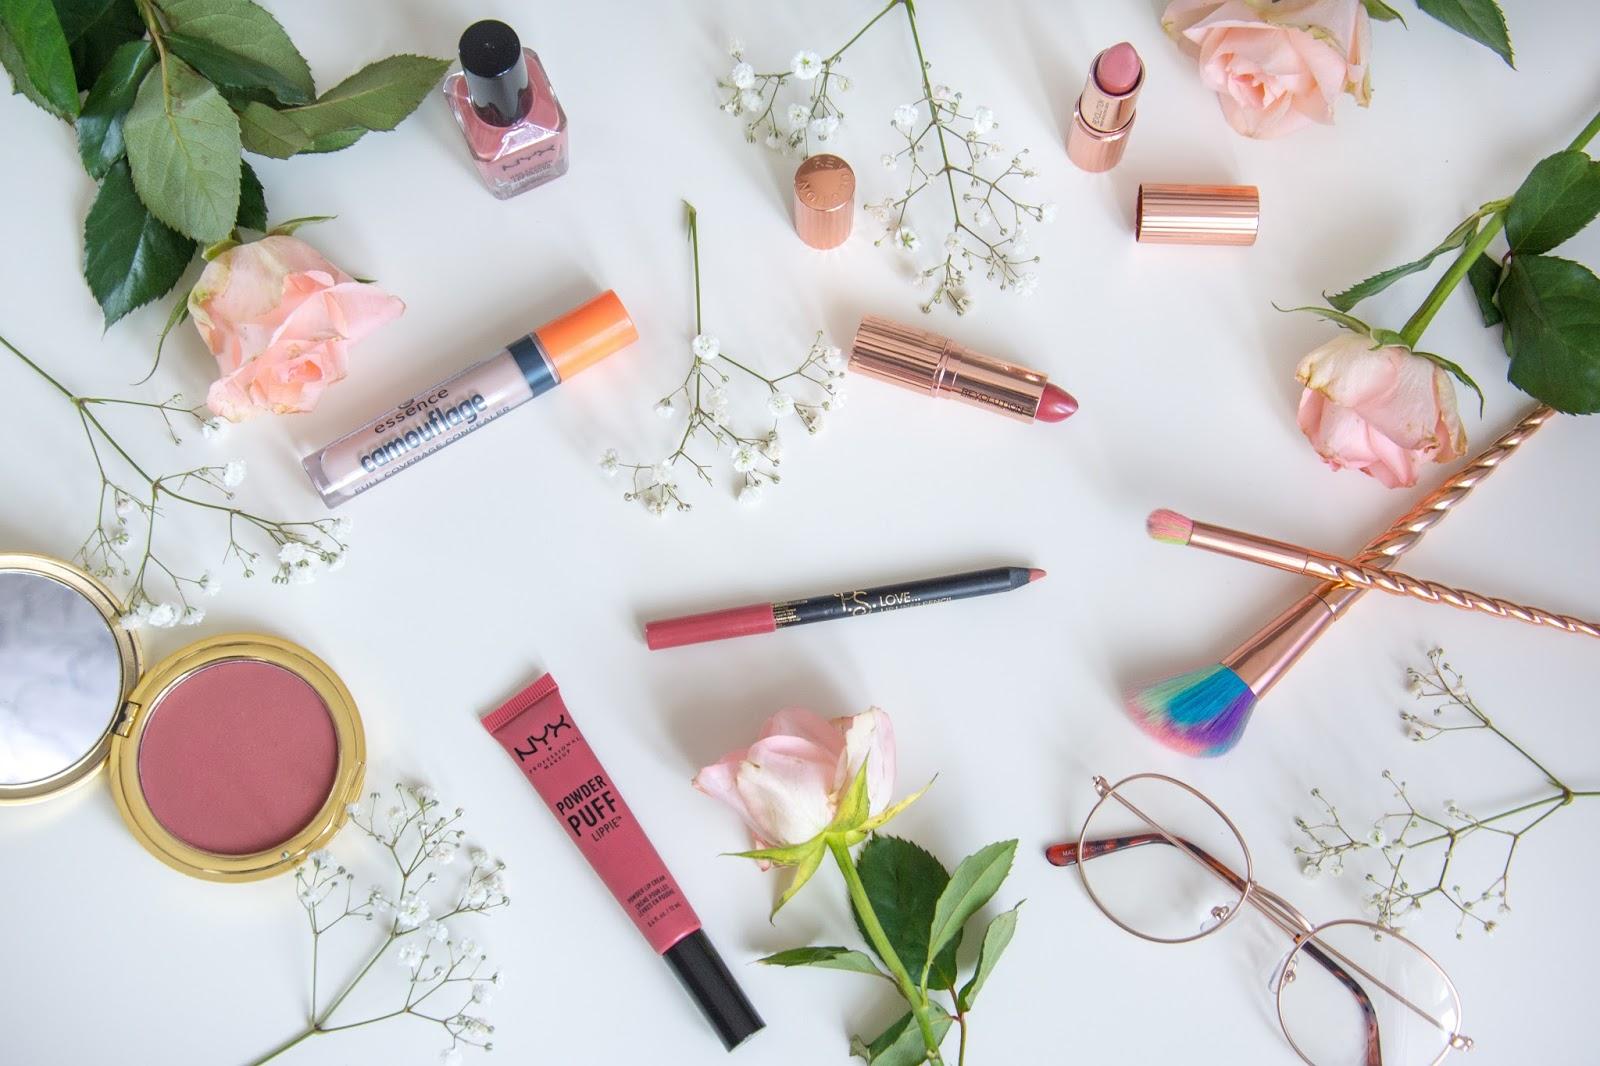 essence camouflage concealer; NYX Nail Polish; Makeup Revolution Renaissance Lipstick; Primark Decorative Glasses; Lahaye Unicorn Brushes; Primark Lipliner; NYX Powder Puff Lip Lipcream; Primark Blush